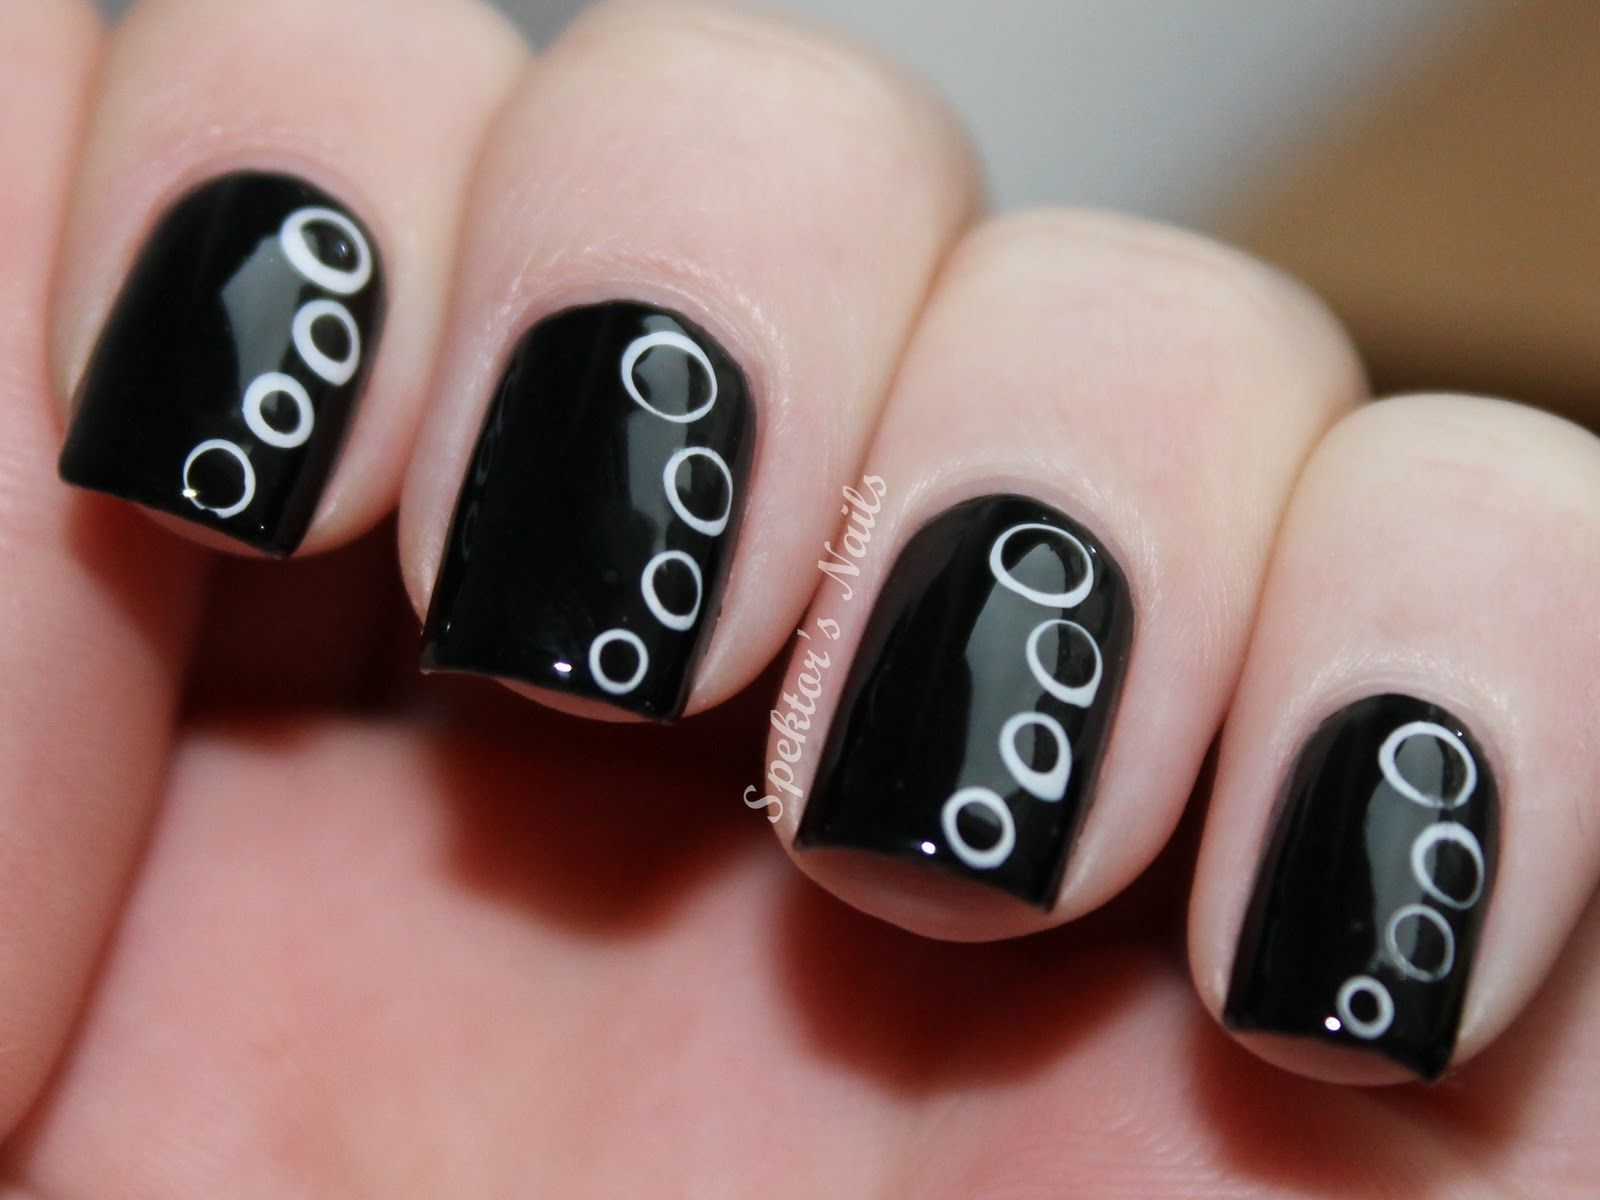 black, white tips toe nail polish | two coats of btgn top sealer